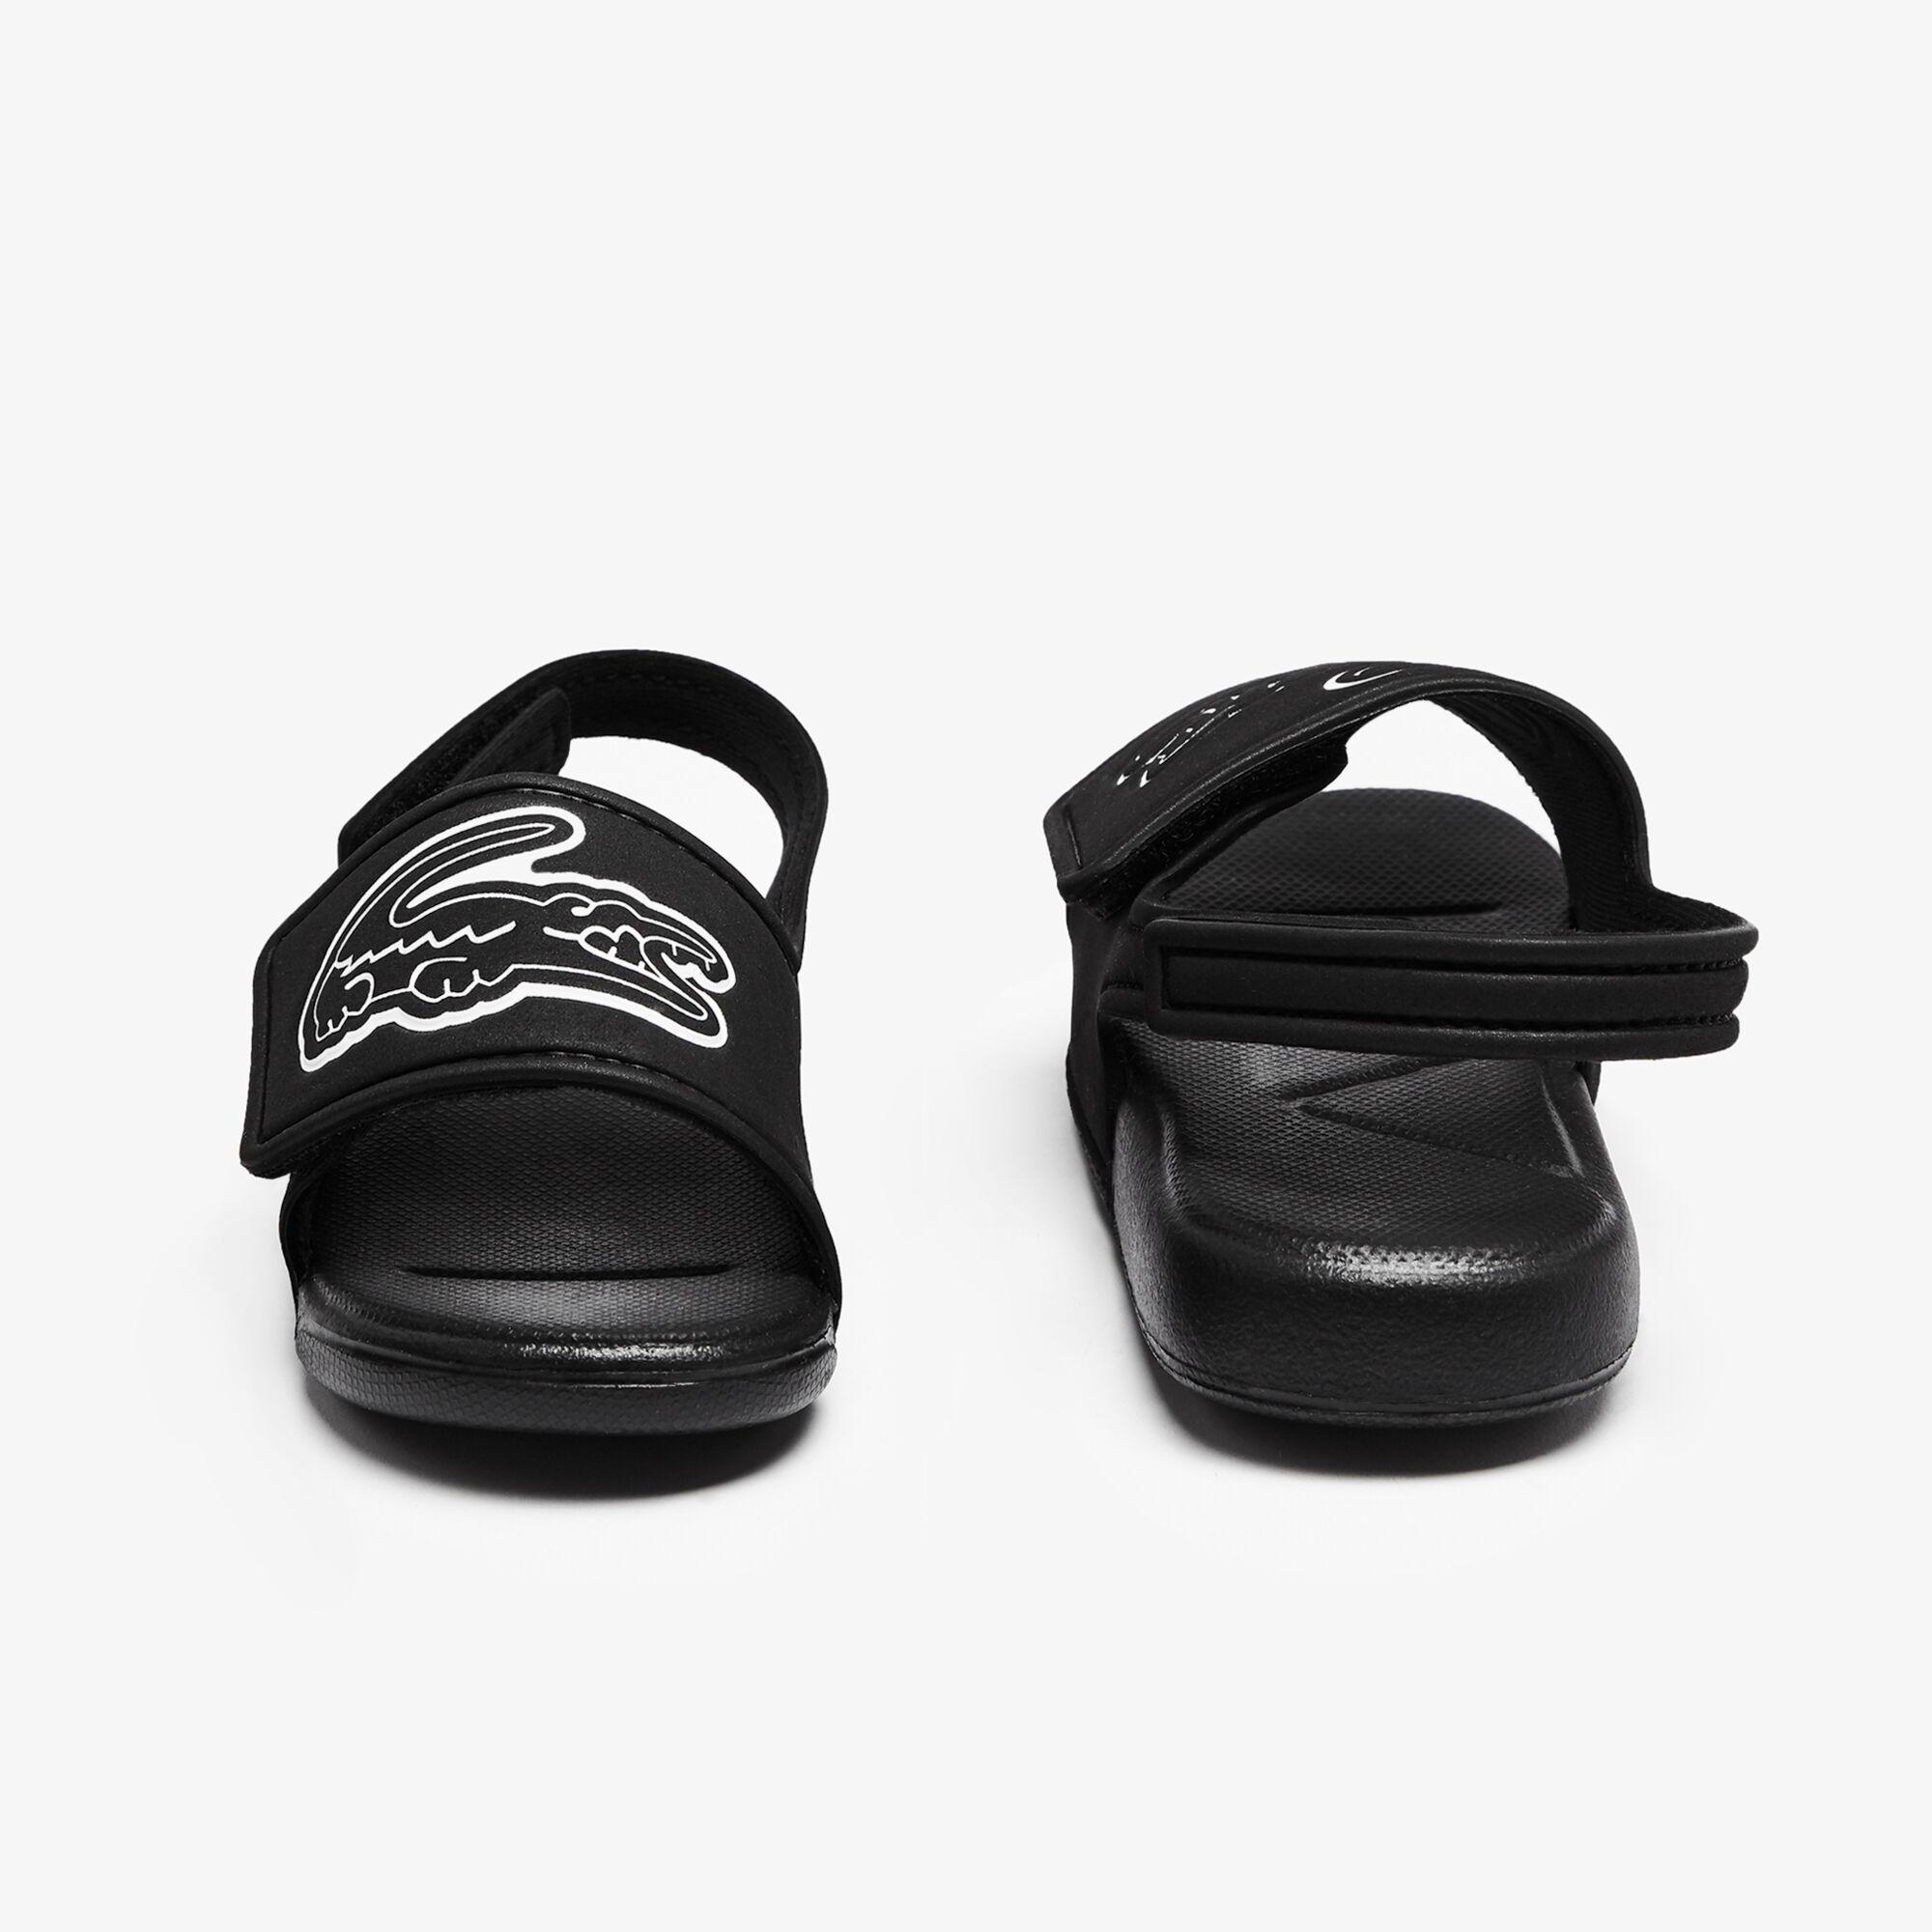 Infants' L.30 Strap Synthetic Sliders